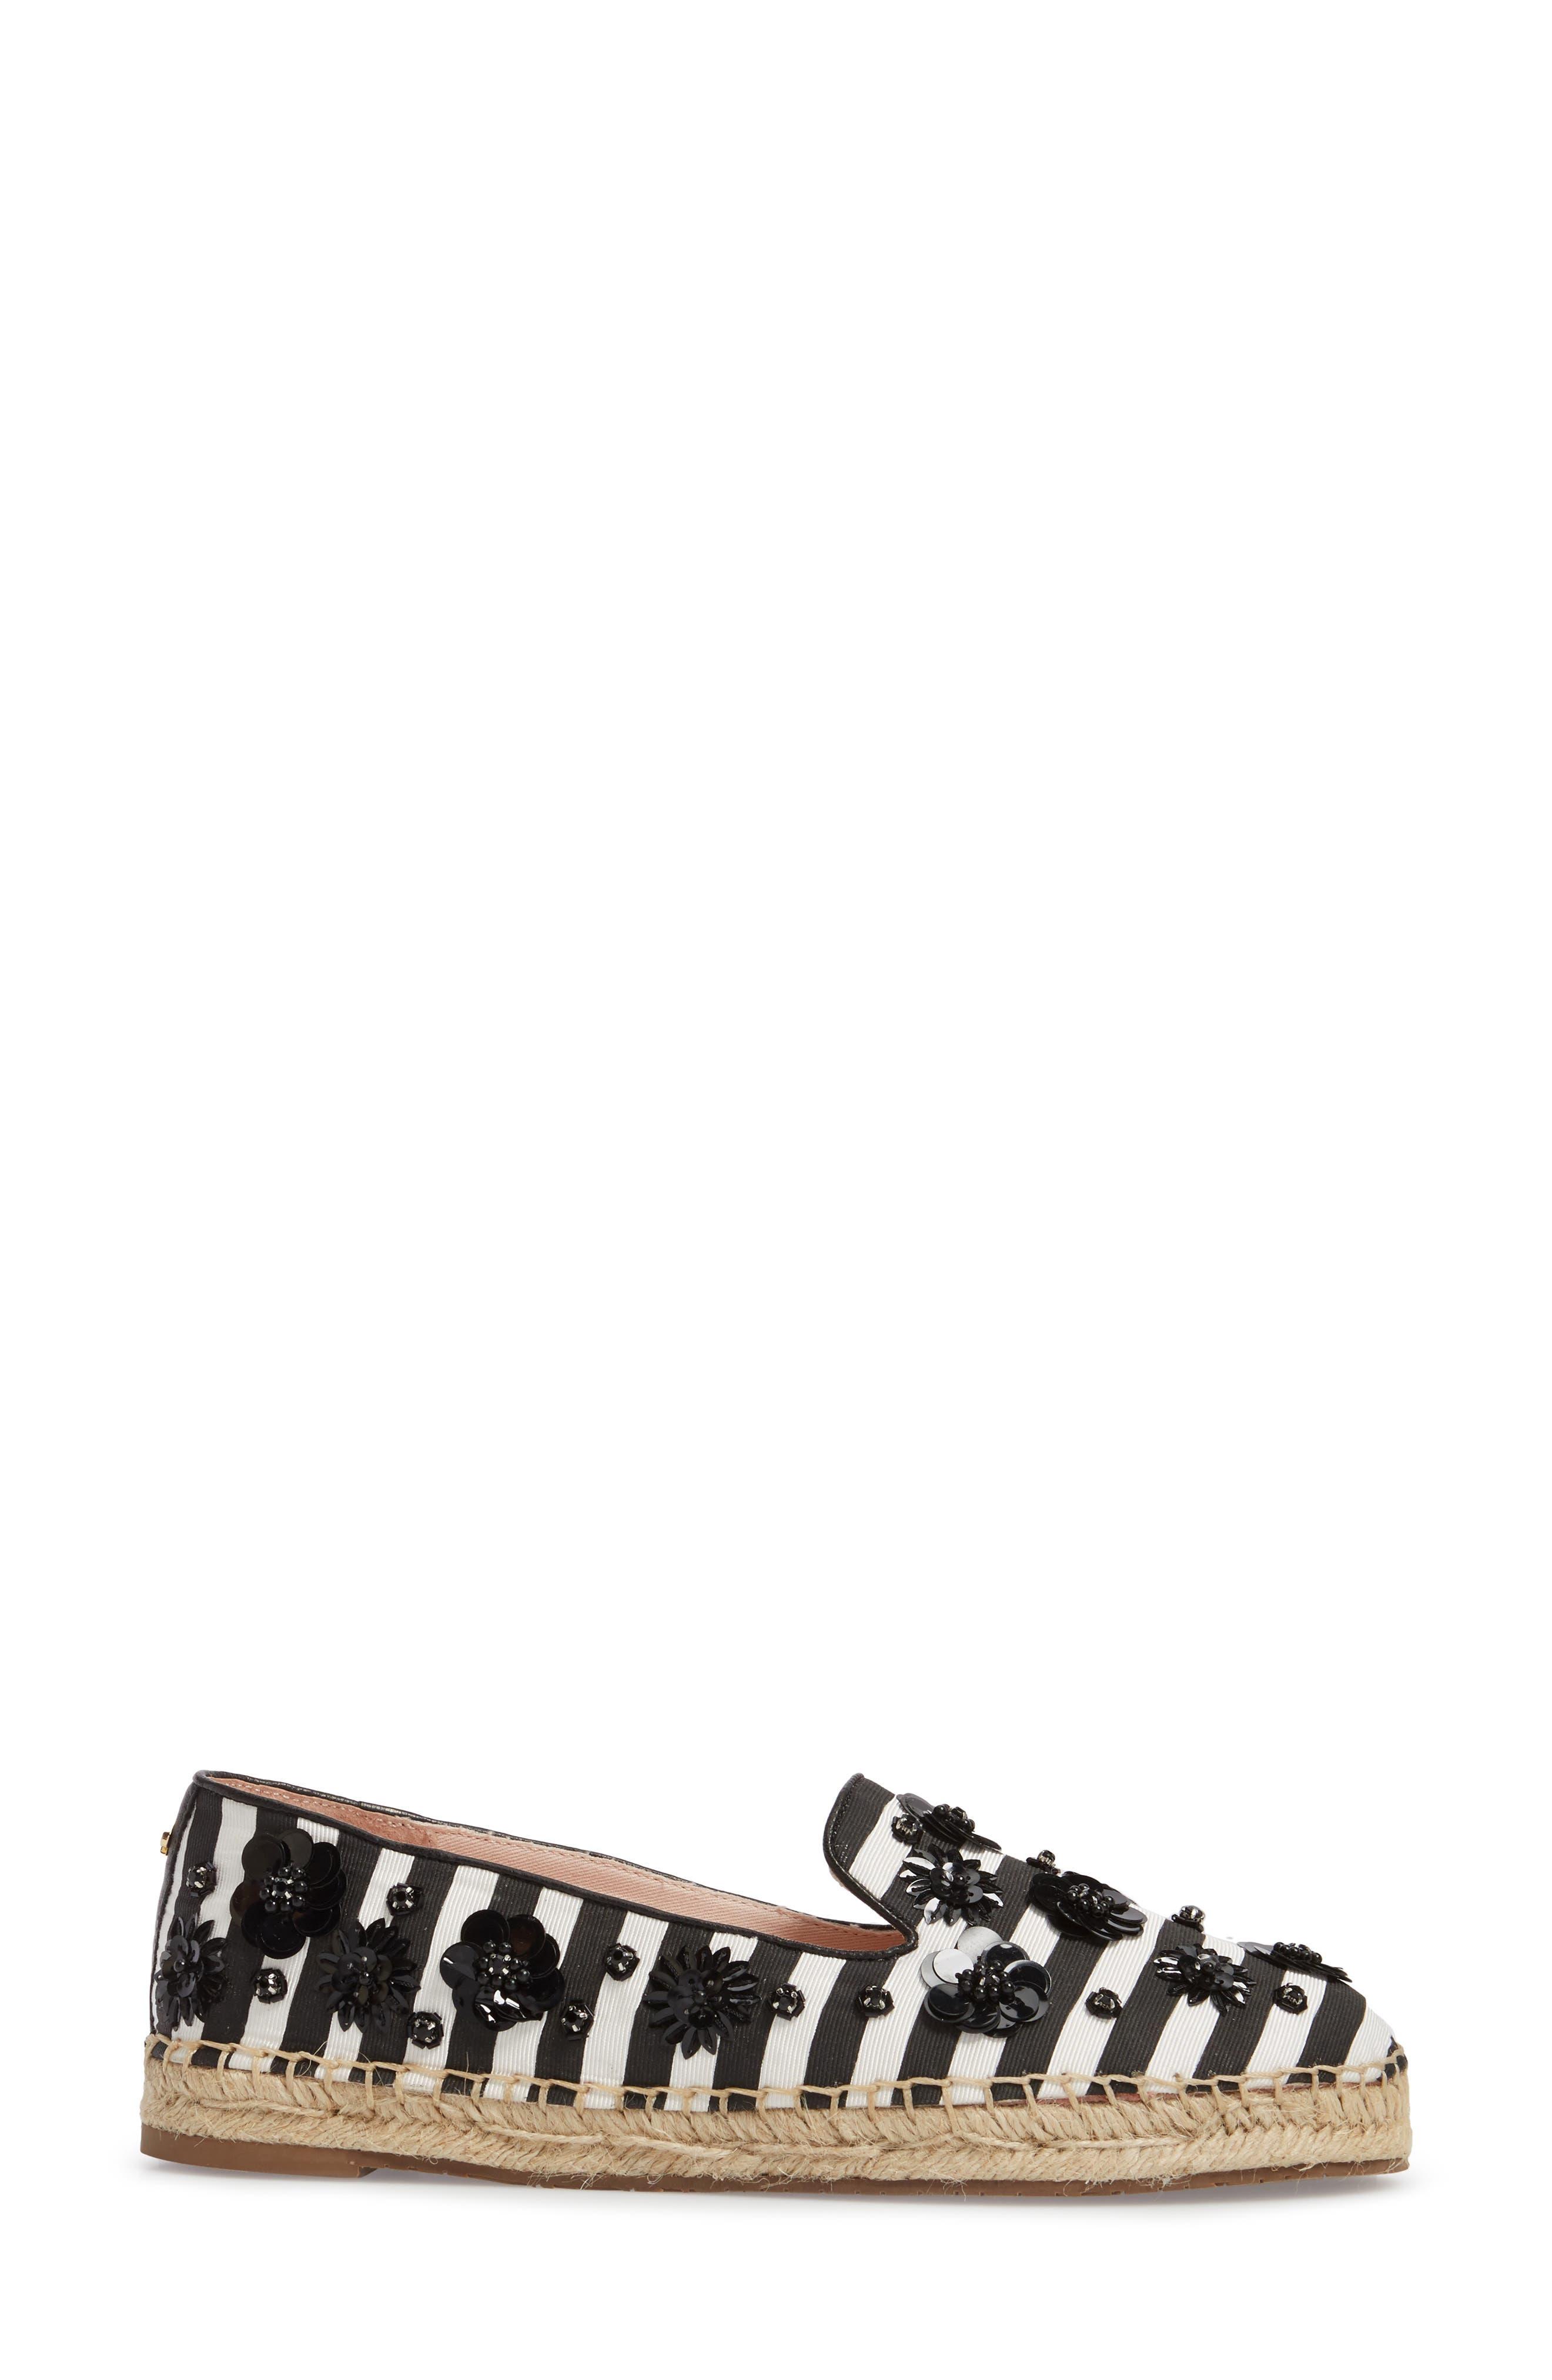 leigh embellished espadrille flat,                             Alternate thumbnail 3, color,                             Black/ White Striped